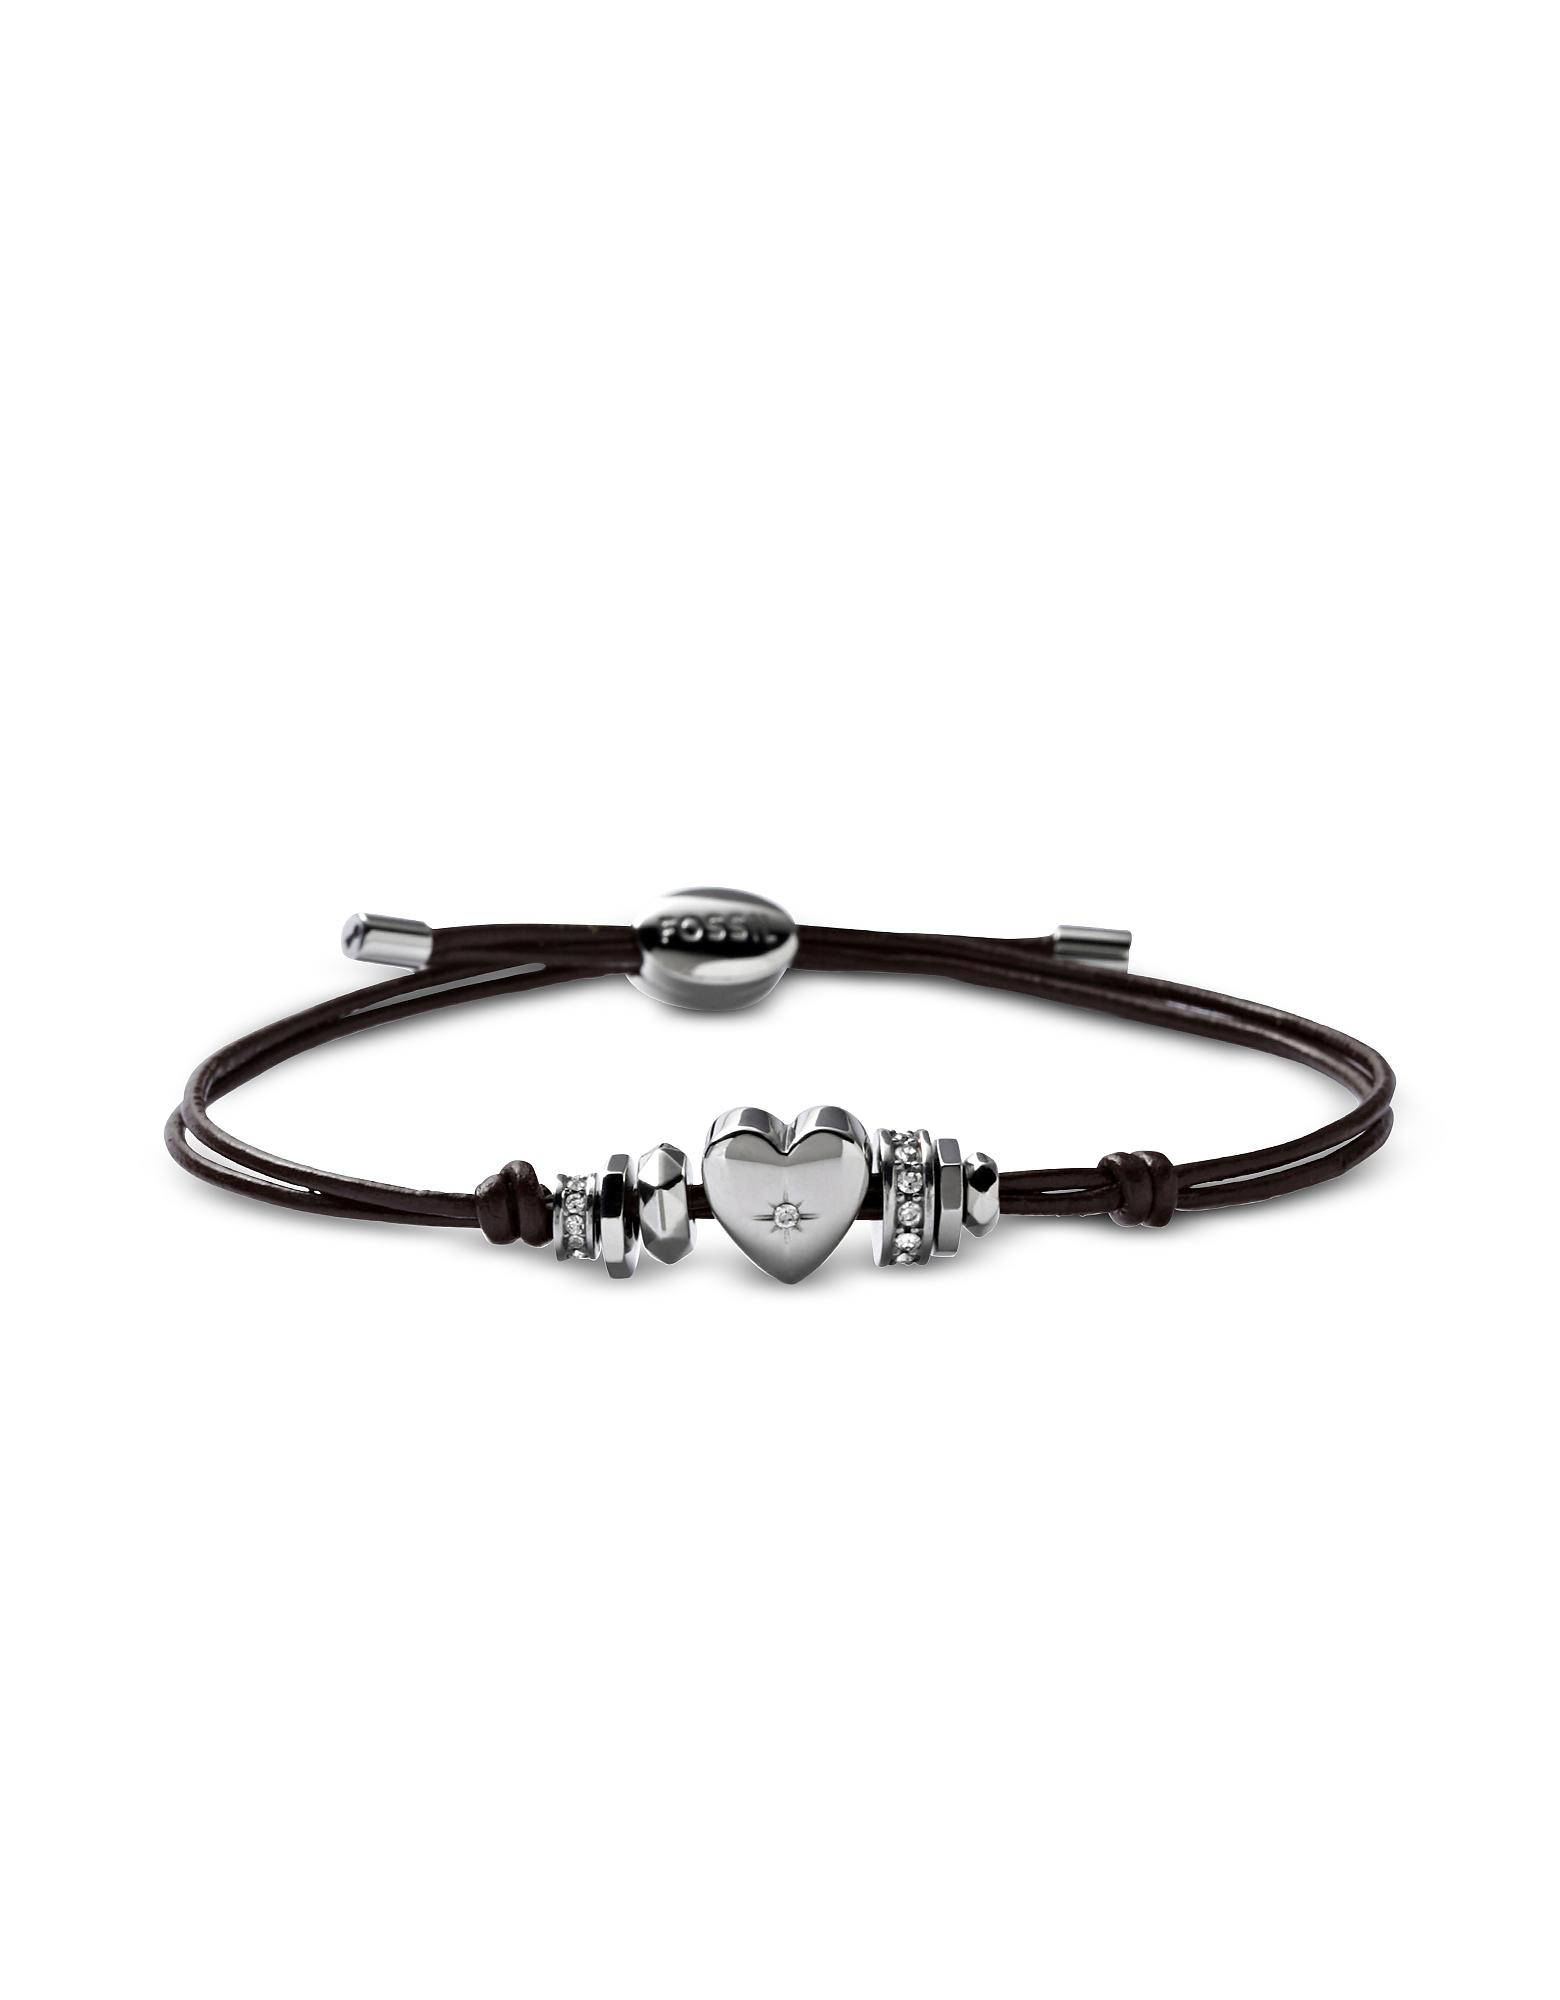 Fossil Womens Nylon Bracelet Leather Black Glitz Heart